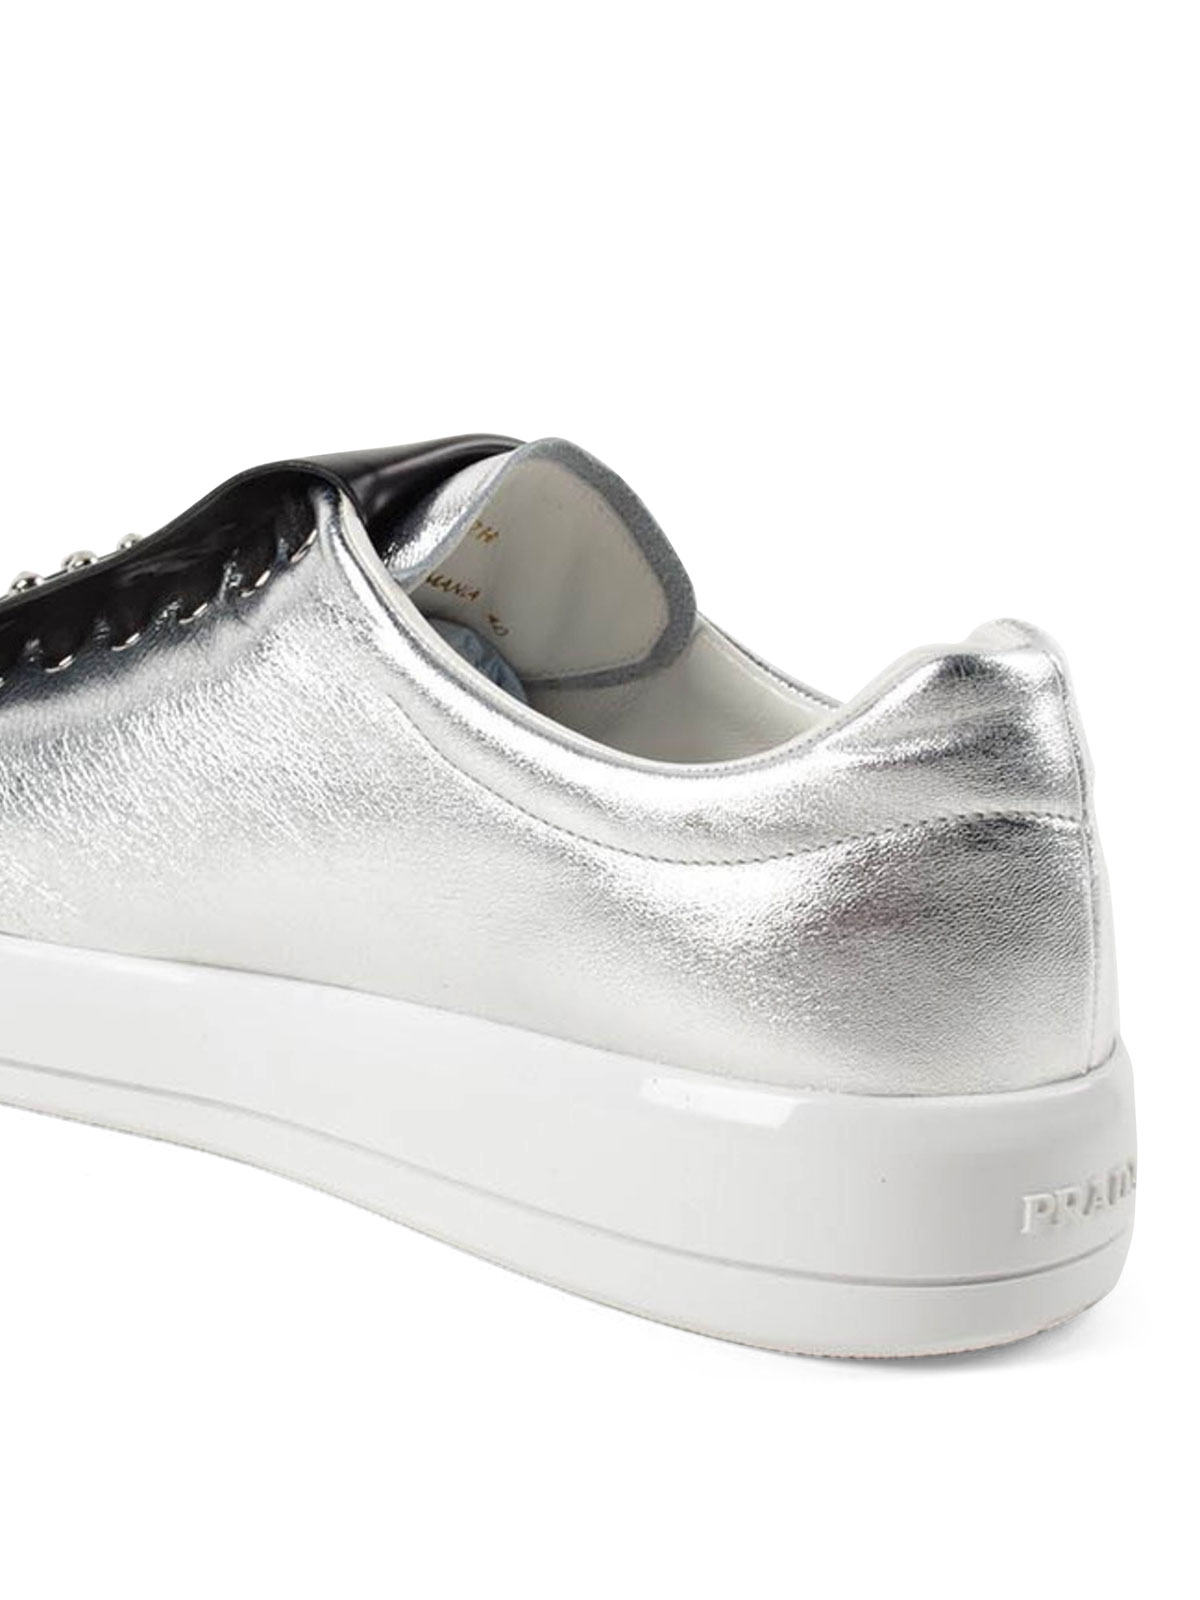 sneaker fur damen silber von prada sneaker ikrix. Black Bedroom Furniture Sets. Home Design Ideas